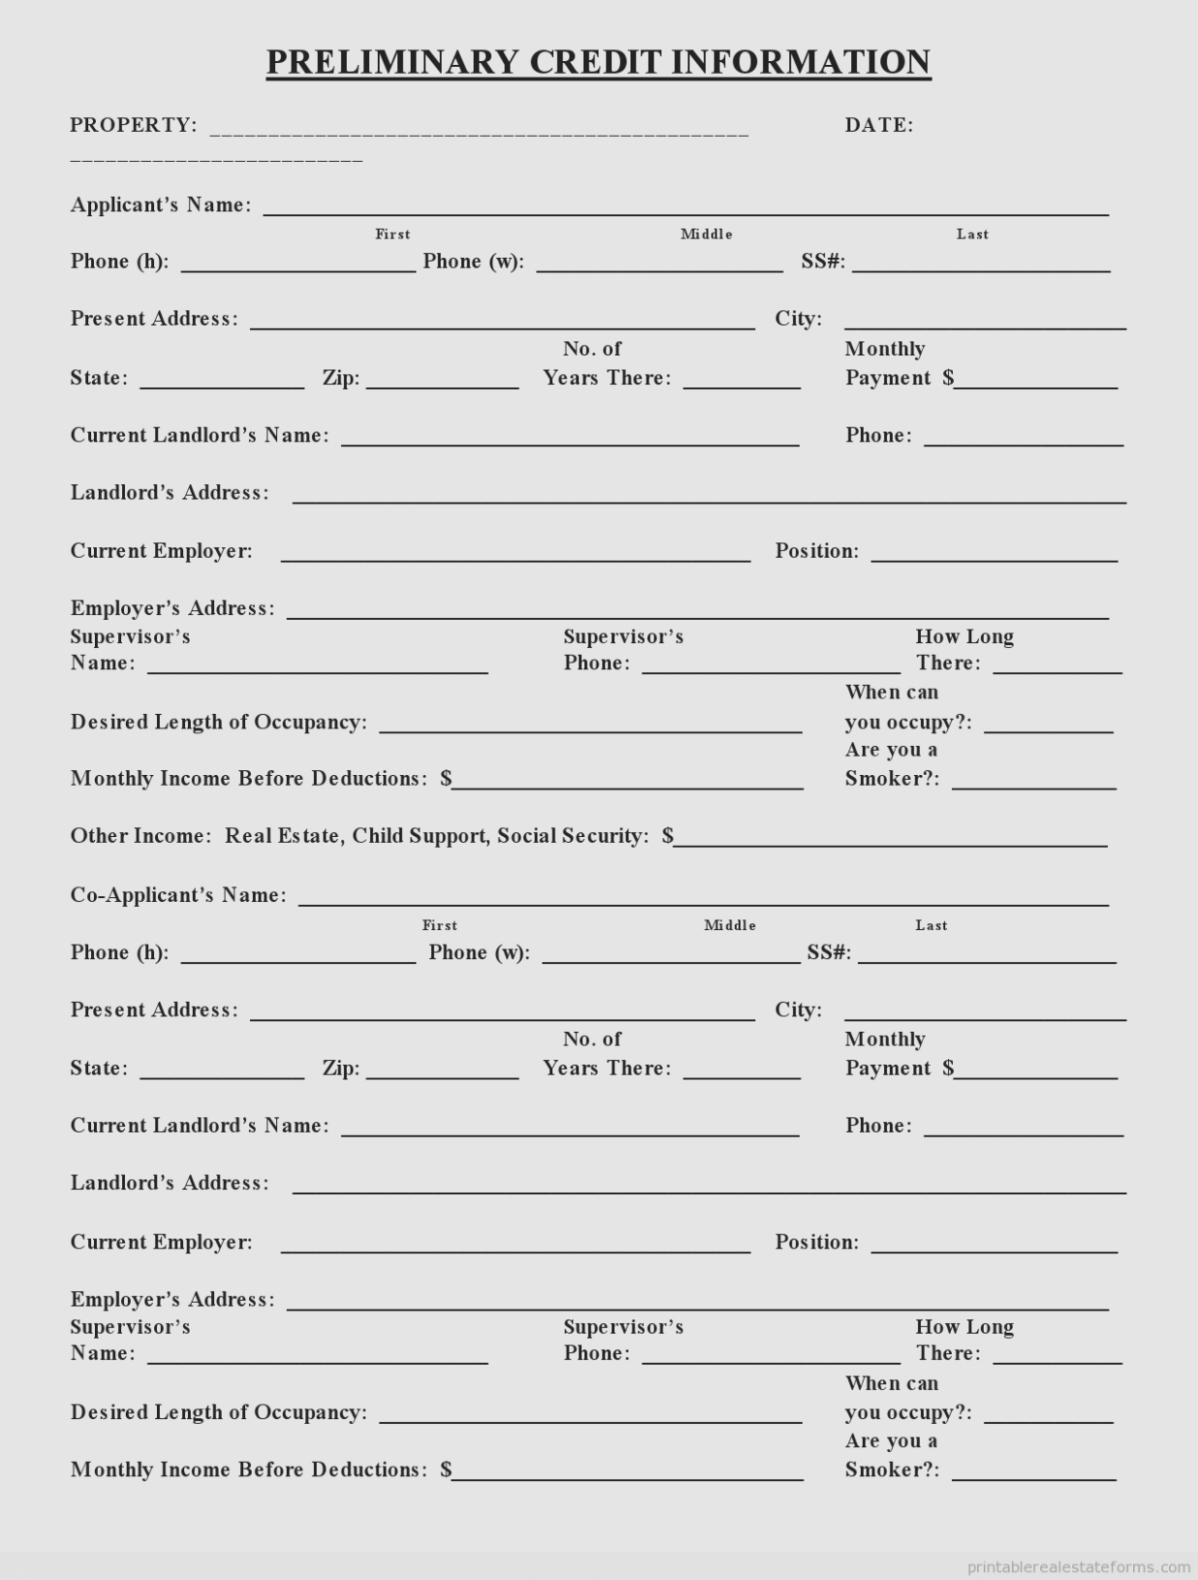 Transunion Printable Dispute Form 15 Best S Of Free Credit Report - Free Credit Report Printable Form